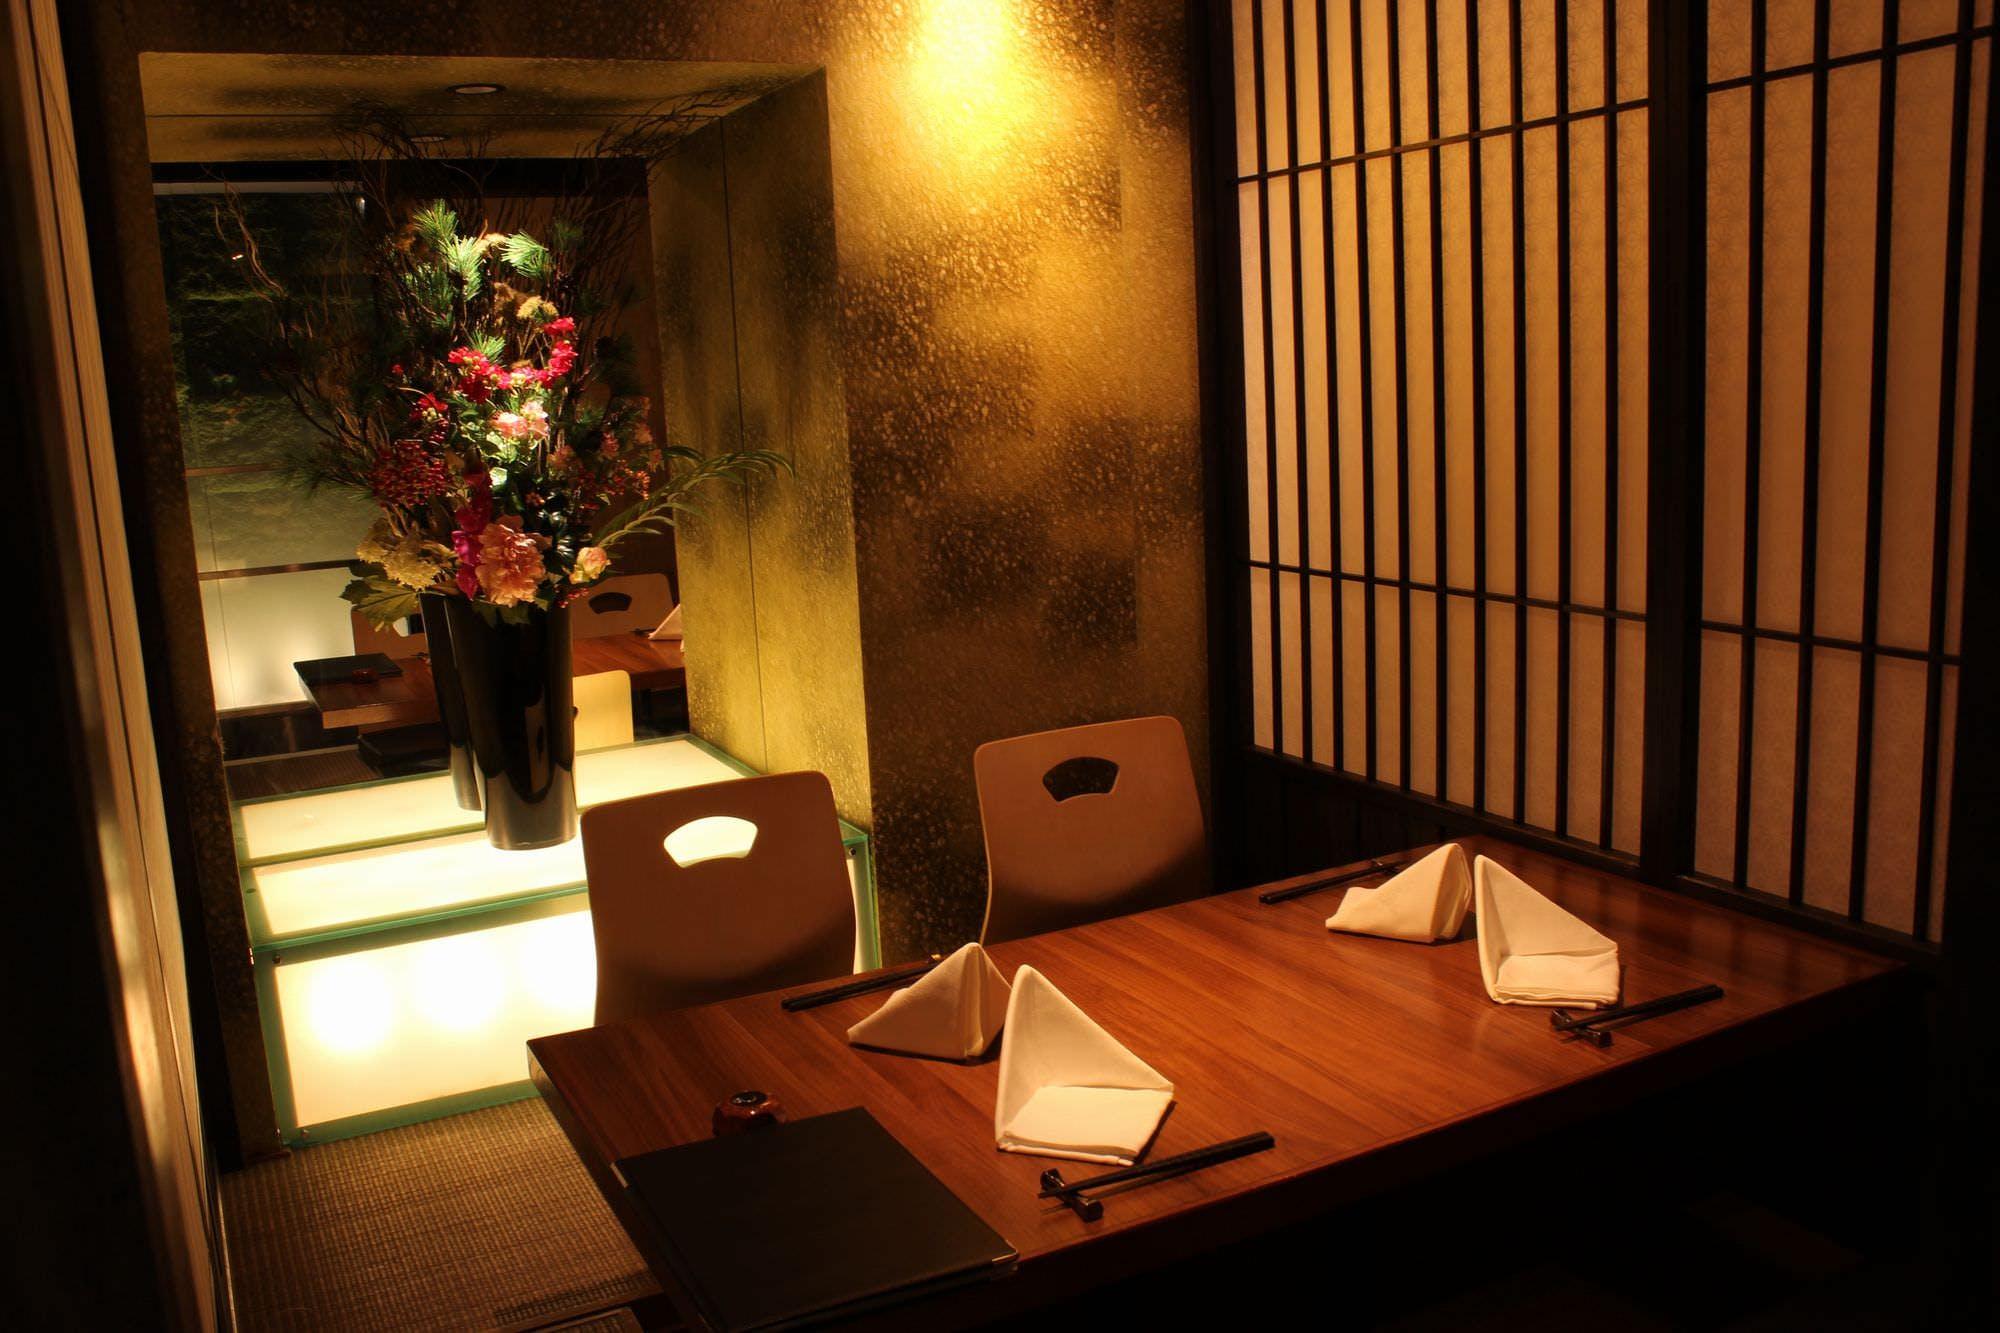 鉄板焼 円居 -MADOy- 横浜